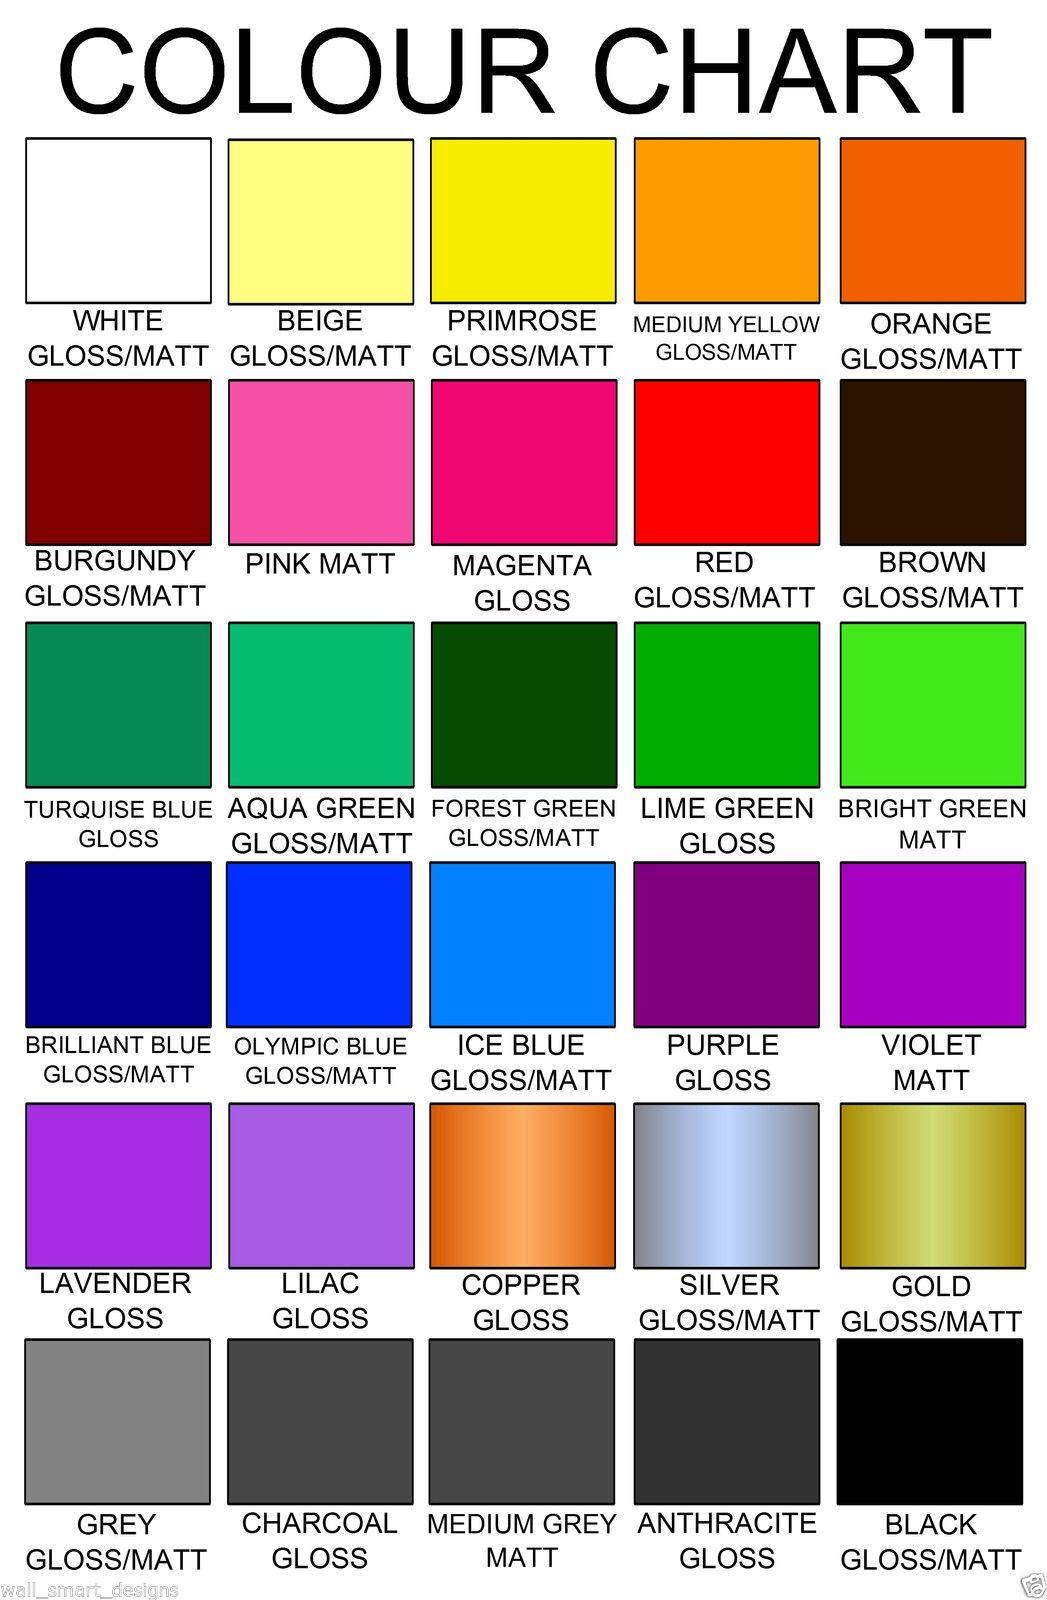 rainbows-Estrellas-Adhesivo-Pared-Salon-Habitacion-Pegatina-Adhesiva-Mural-FRASE